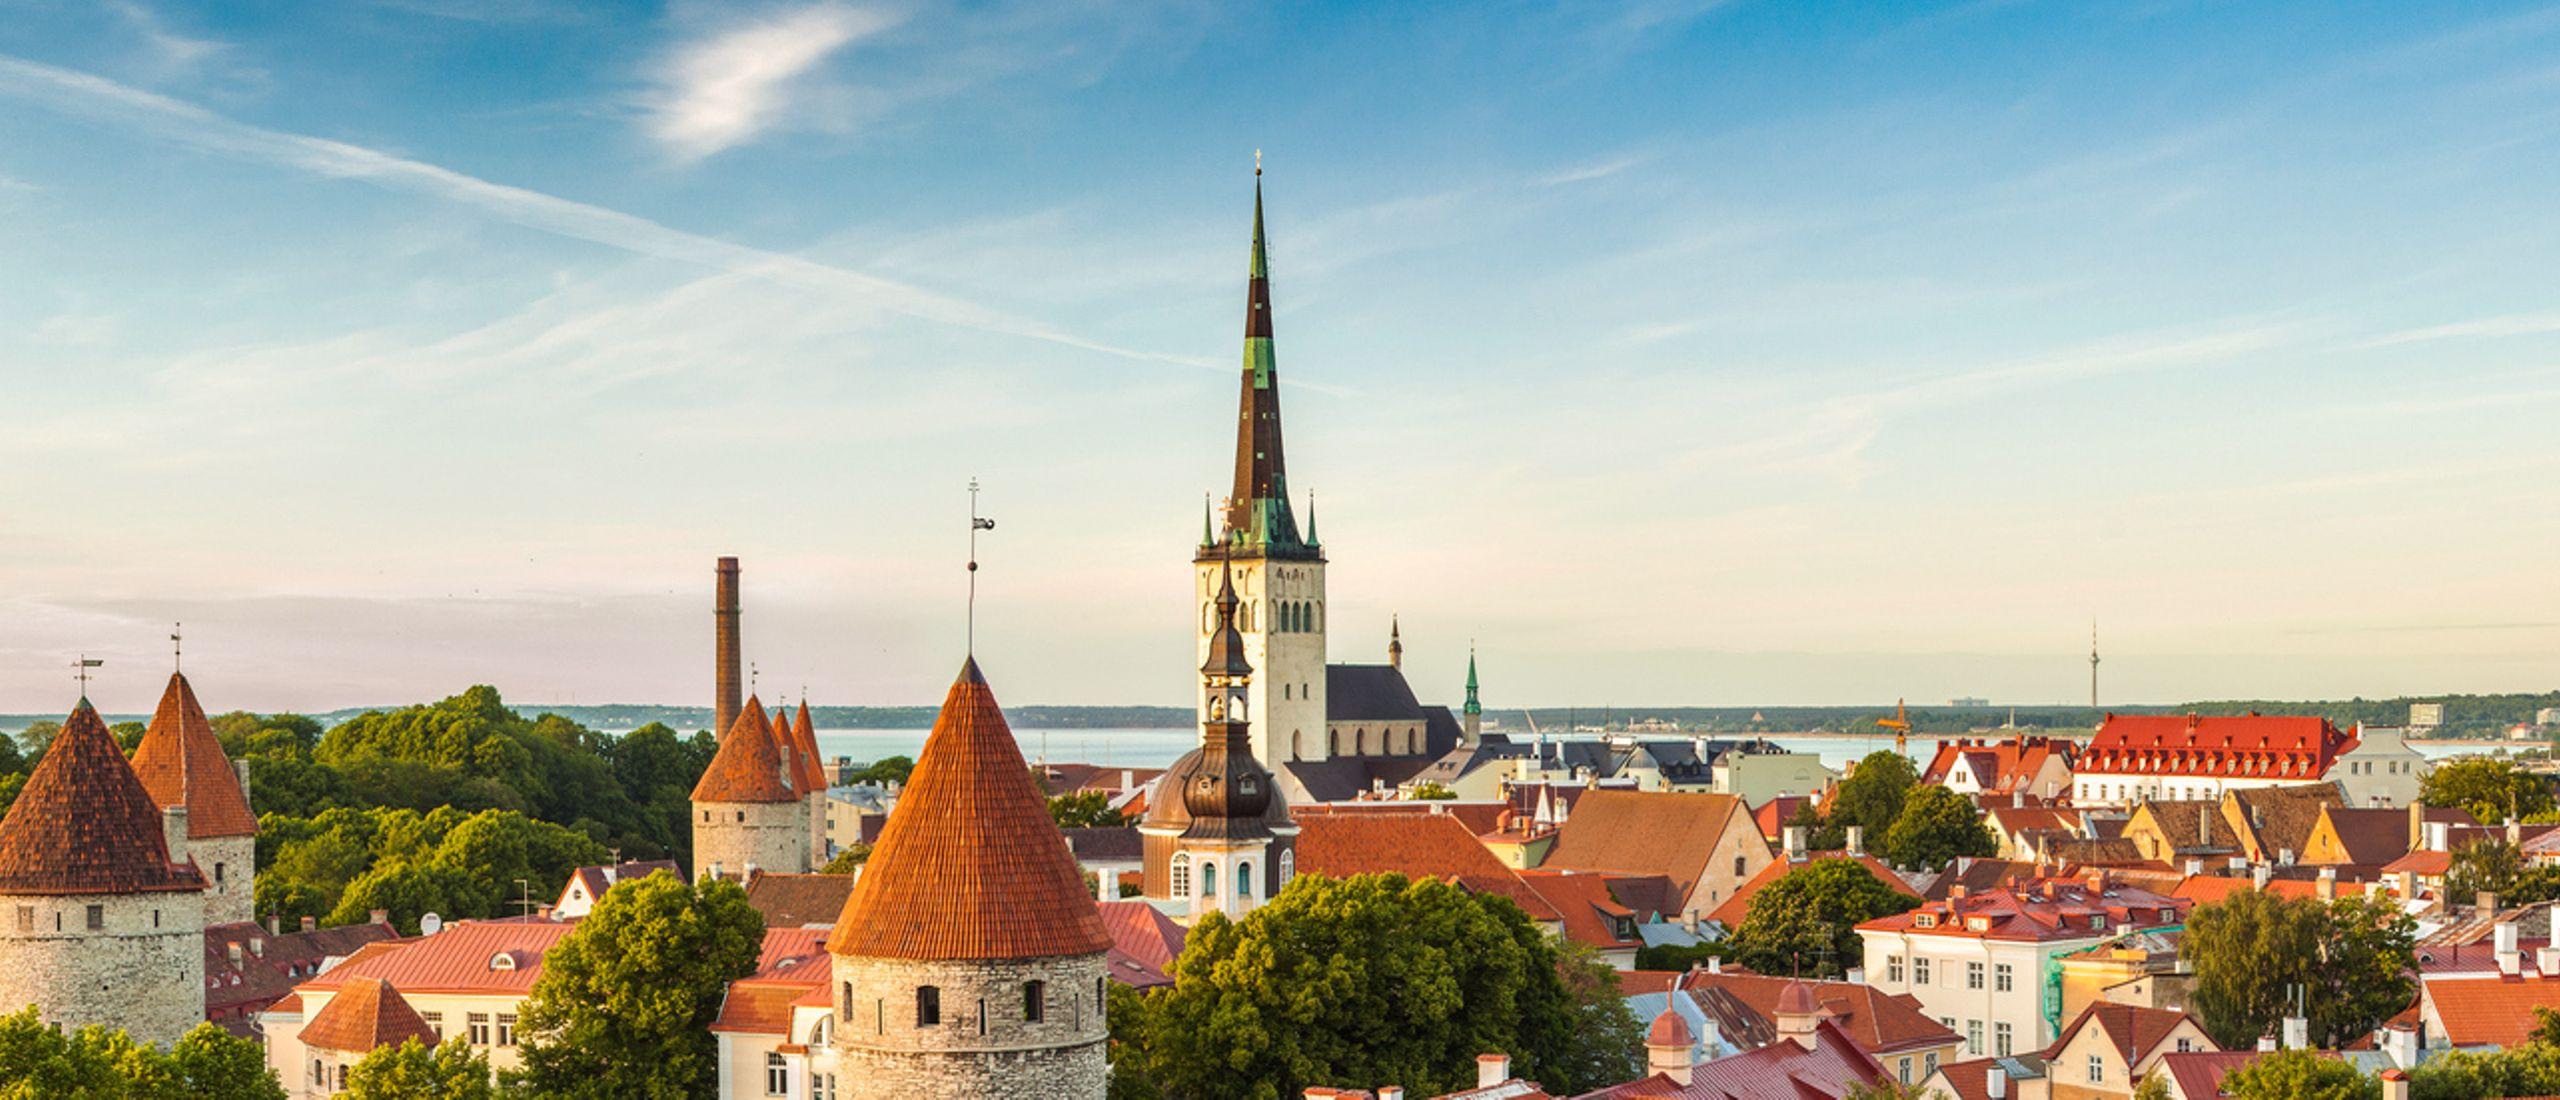 a6b99e49c38 Tallinn Old Town and Kalamaja Walking Tour - Private Tour